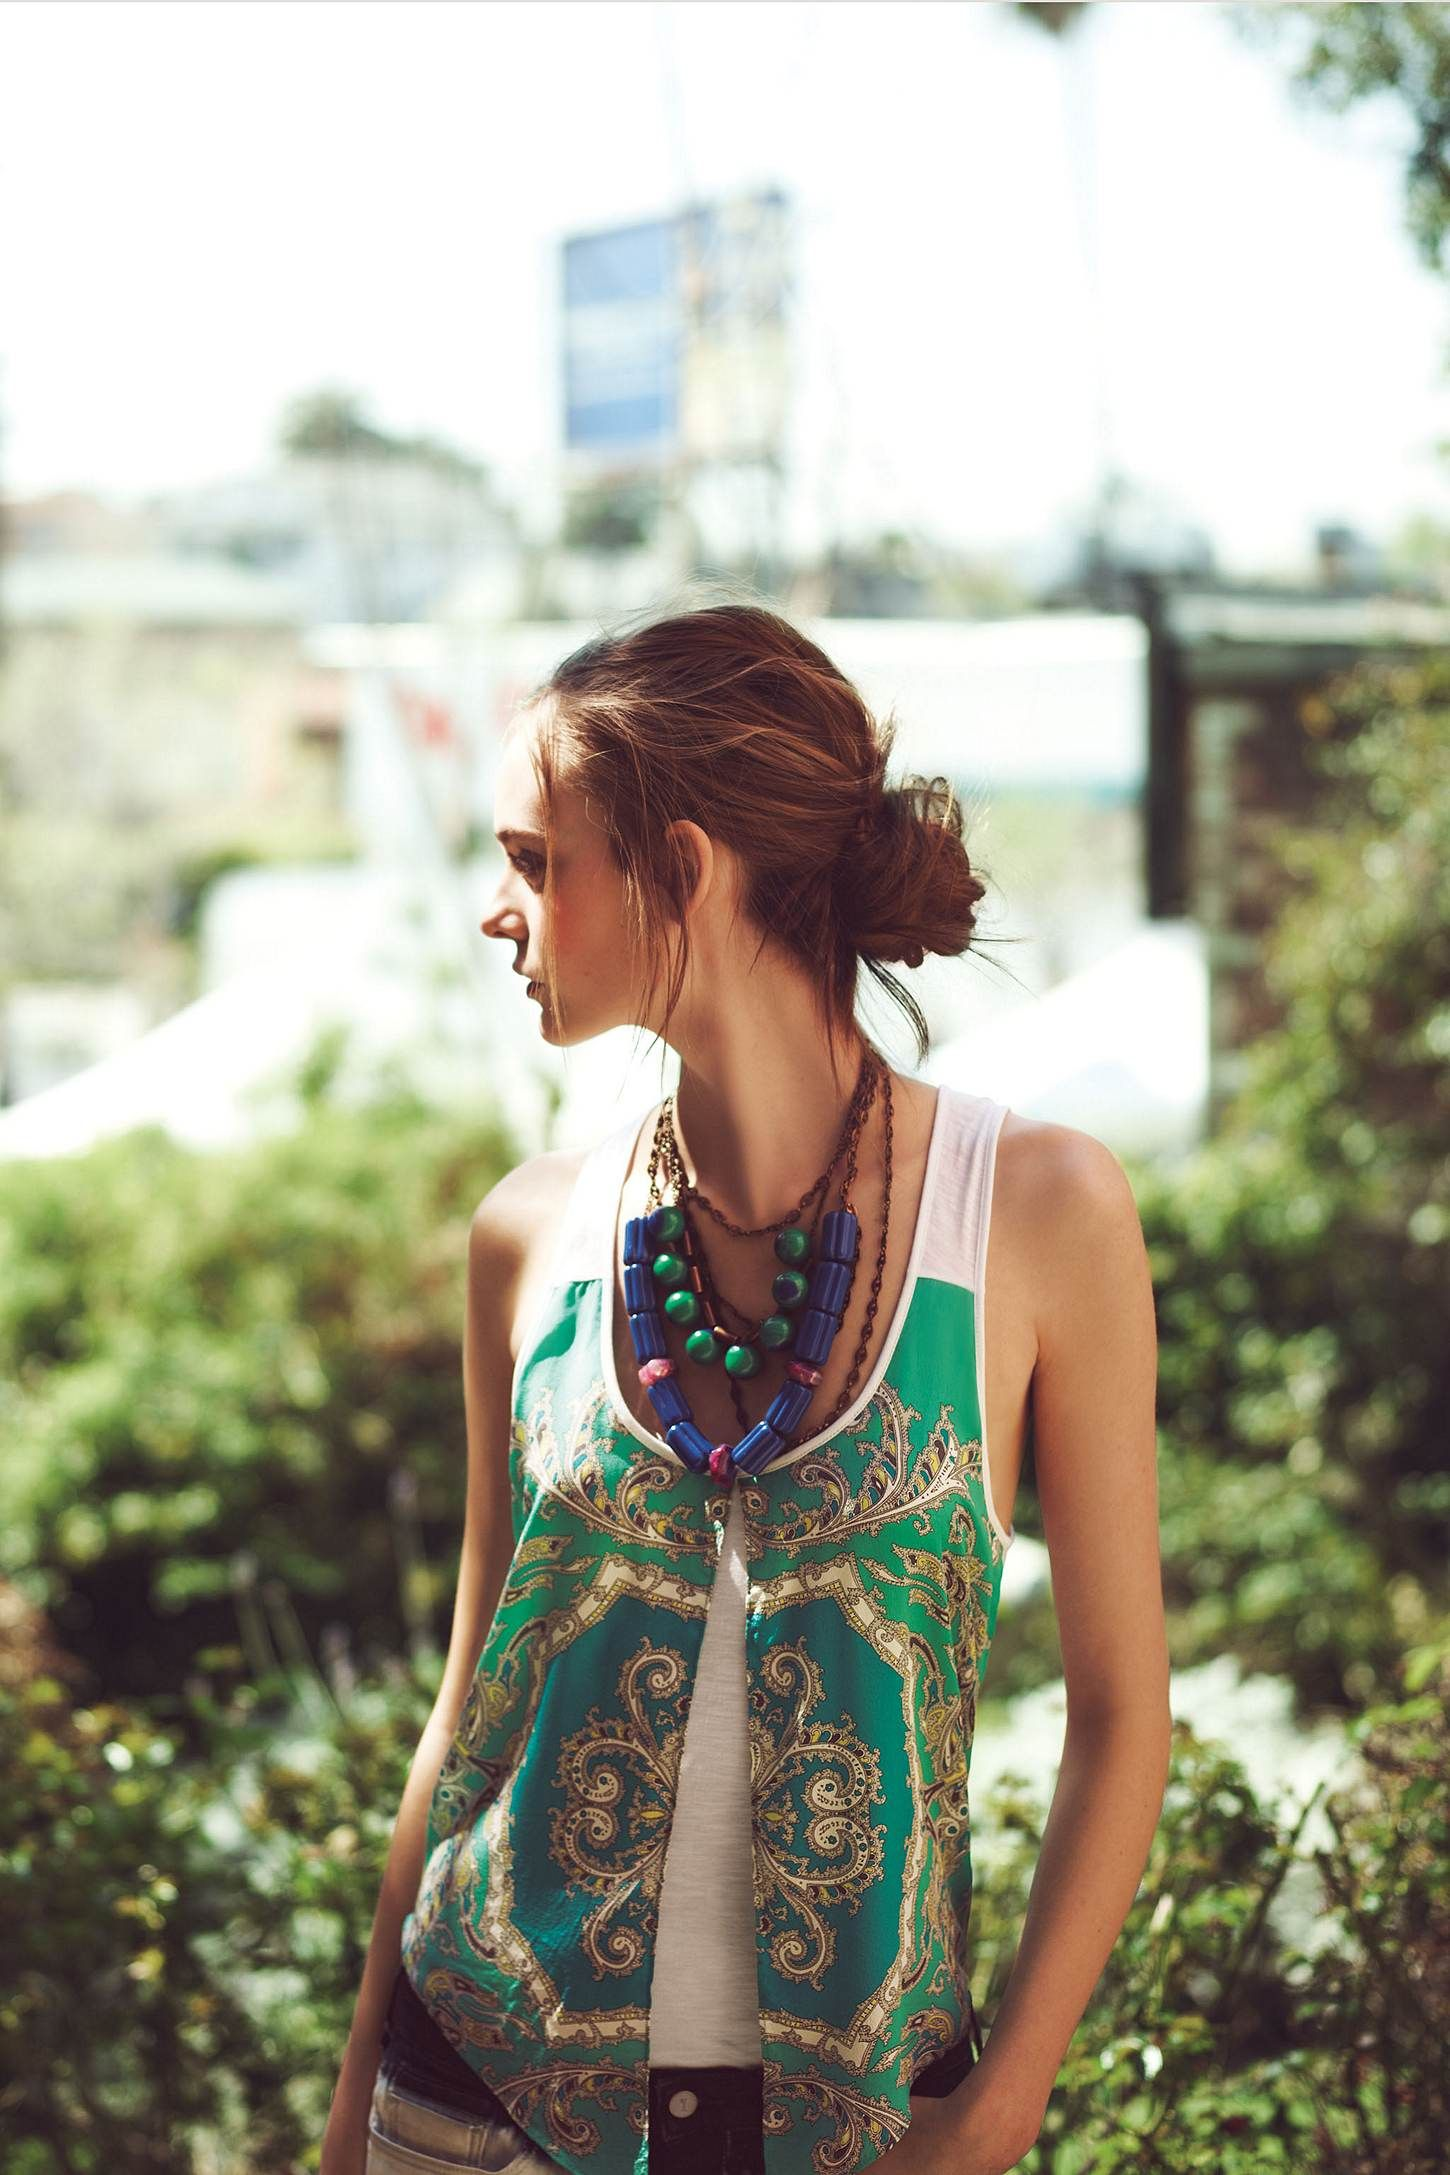 Anthropologie Inspiration - repurposed scarf sewn onto t-shirt tank